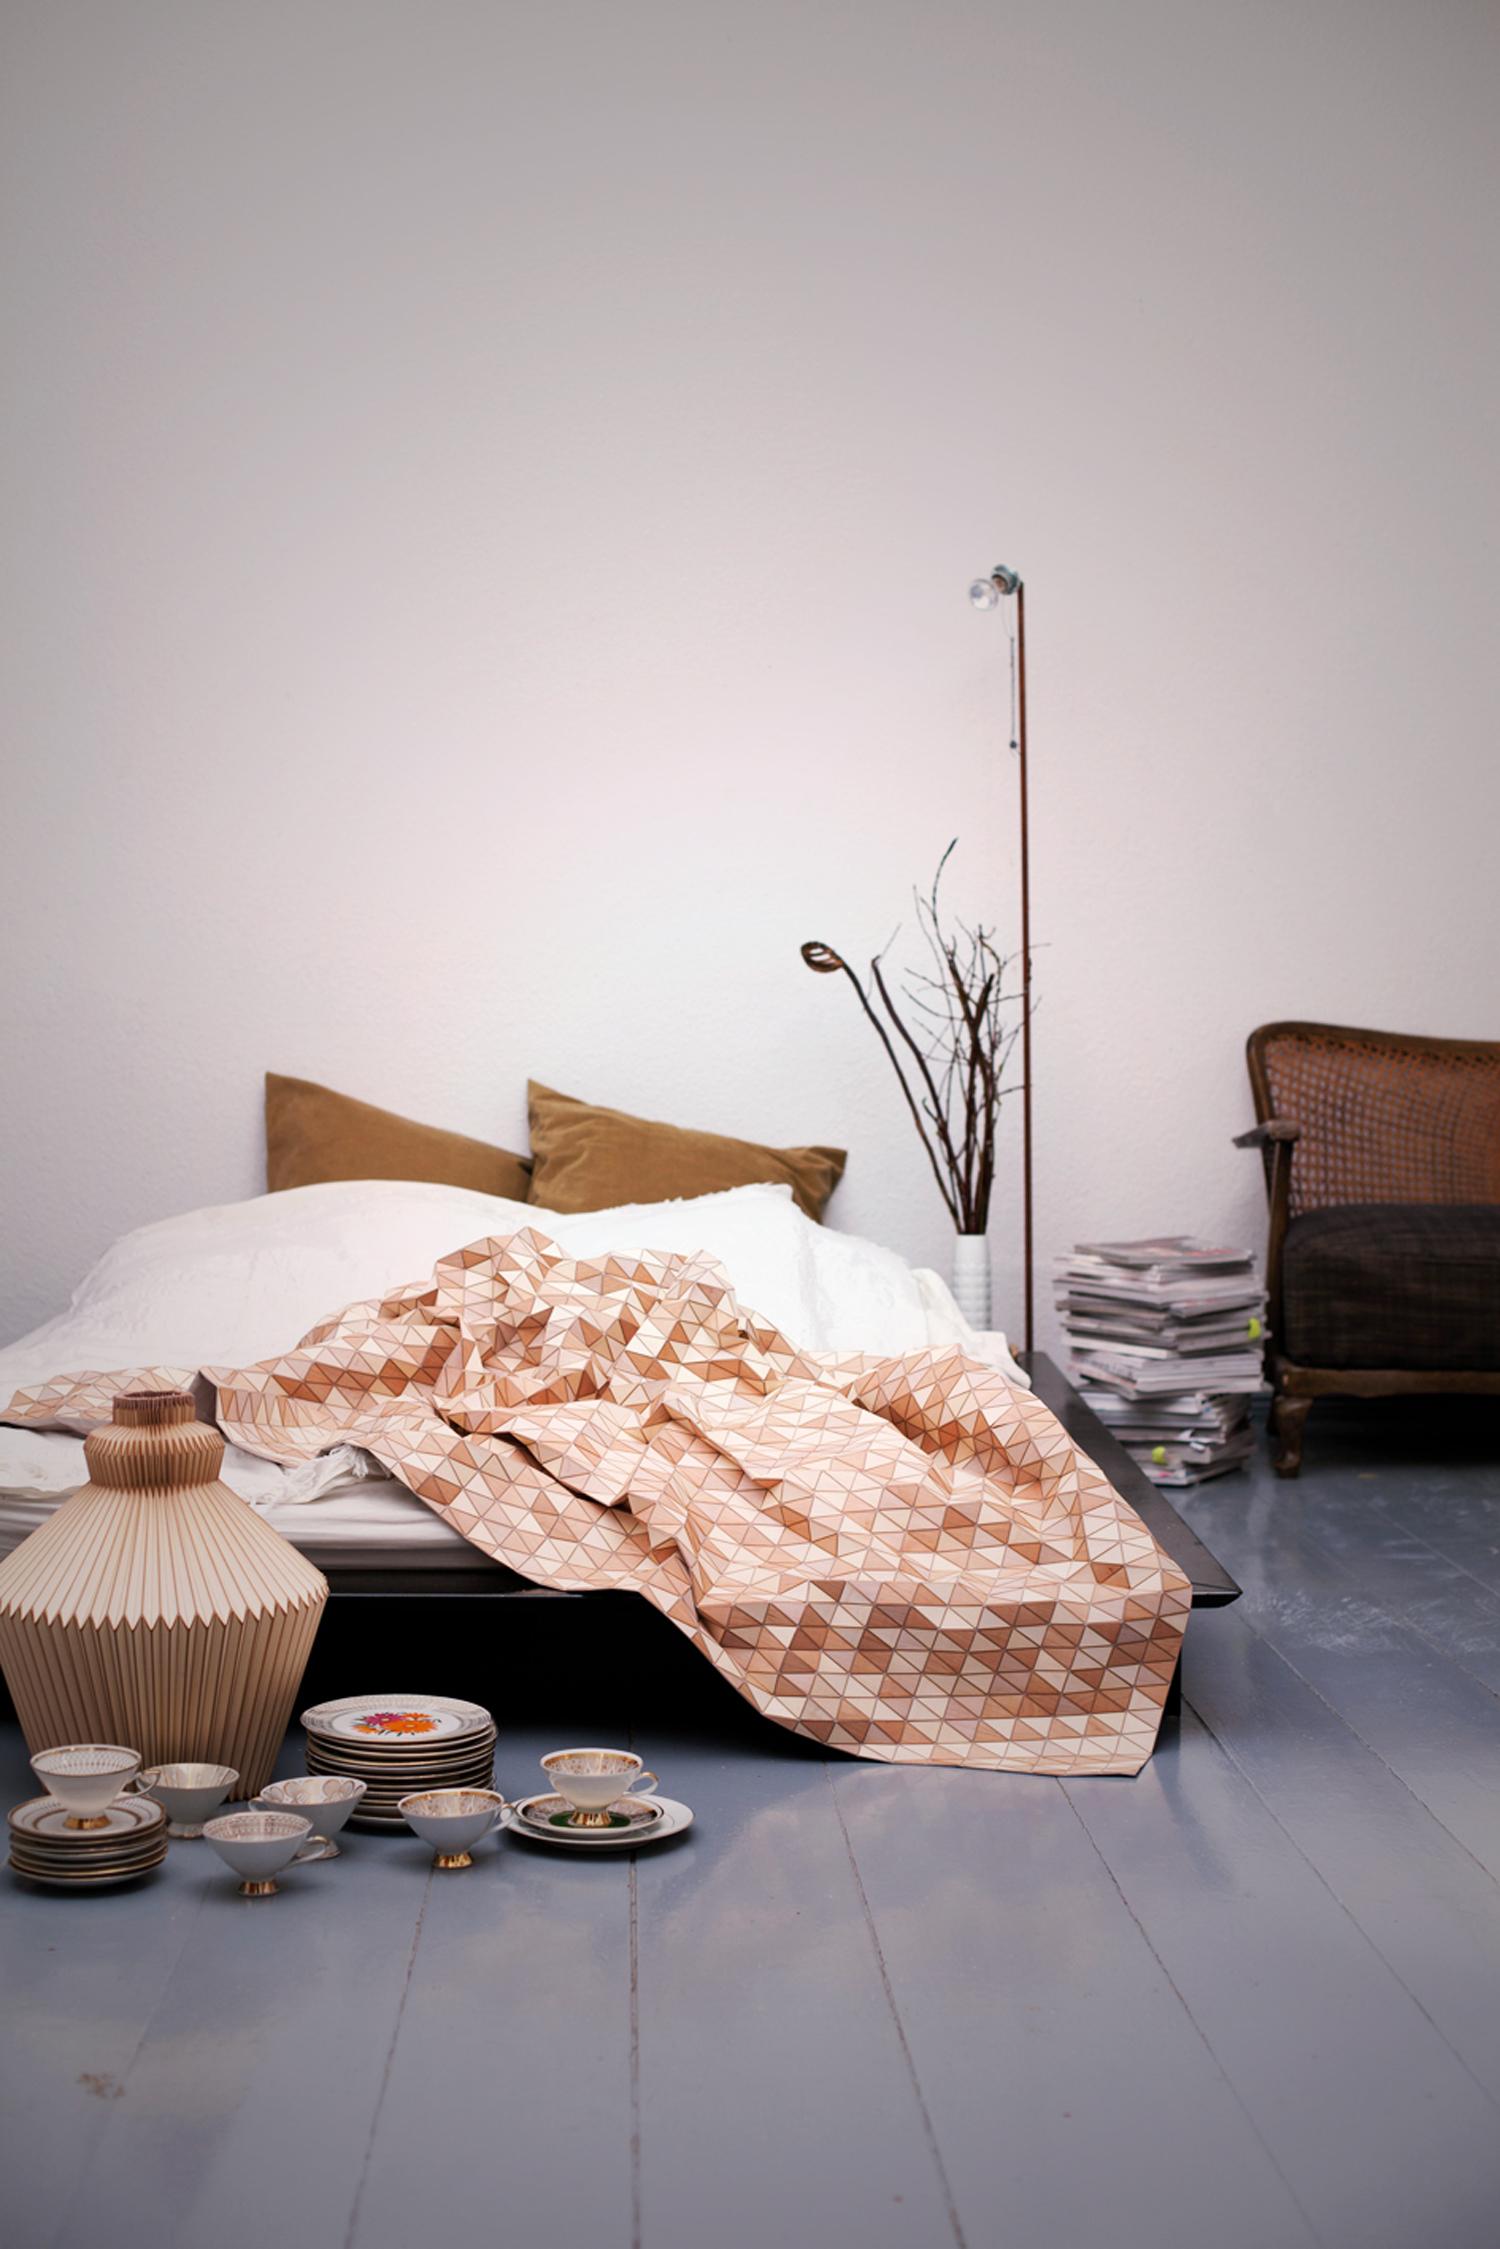 wooden-textile-no-6912.jpg